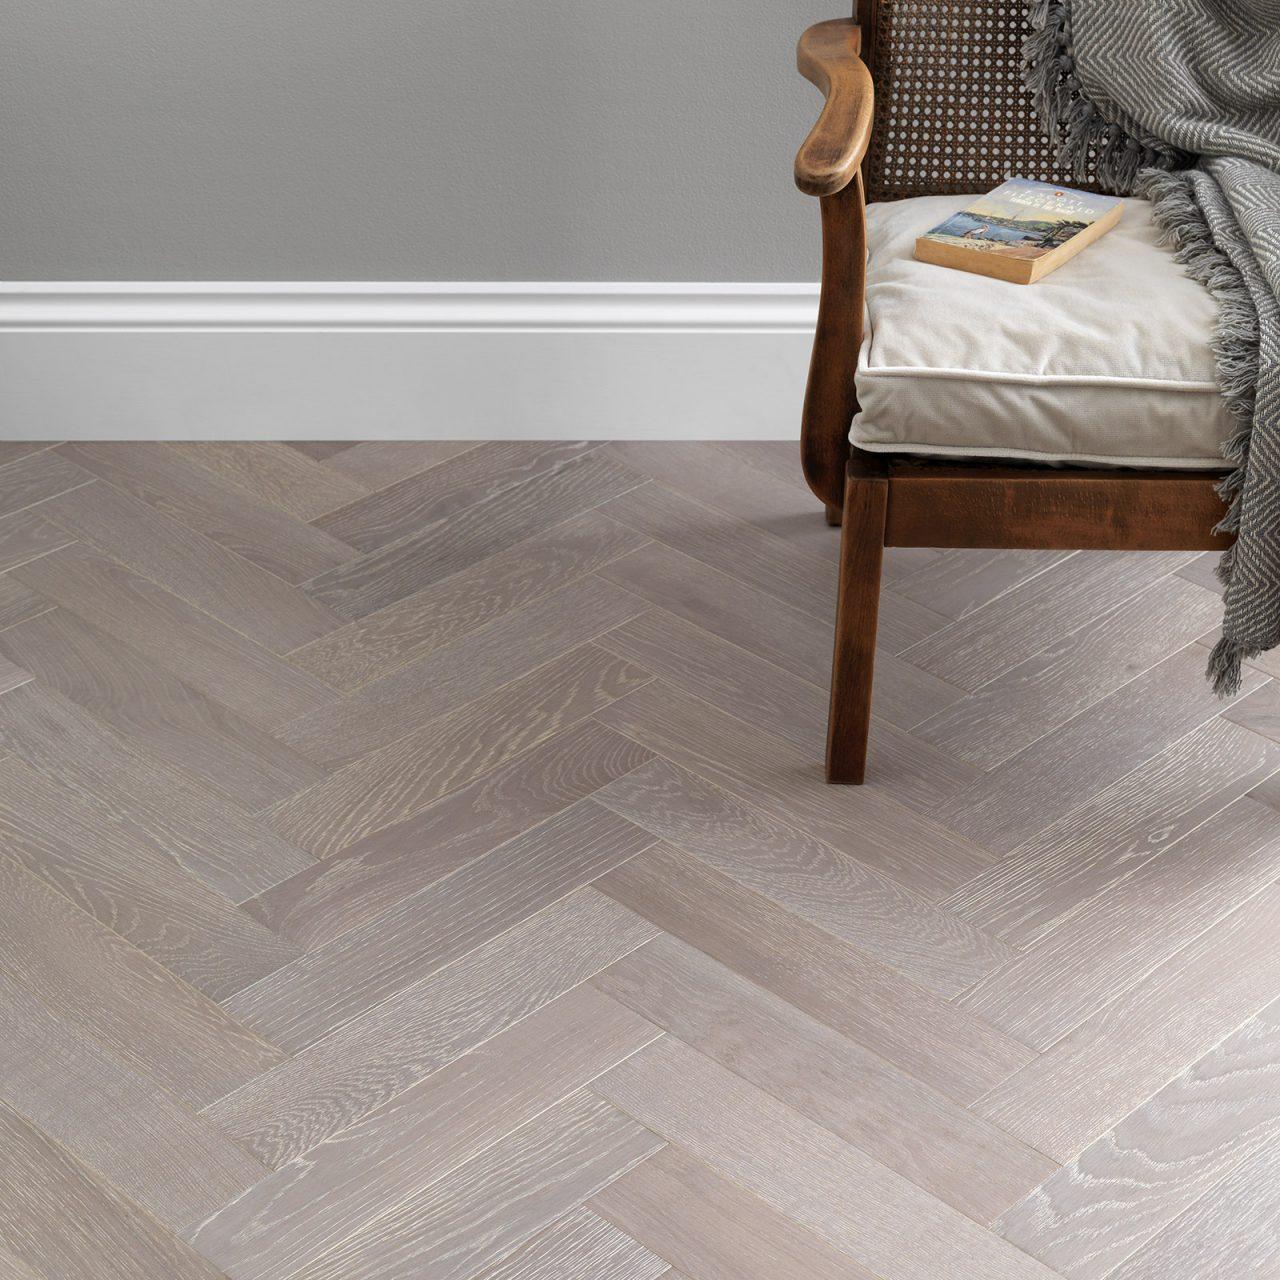 Engineered herringbone wood flooring. Goodrich Feather Oak